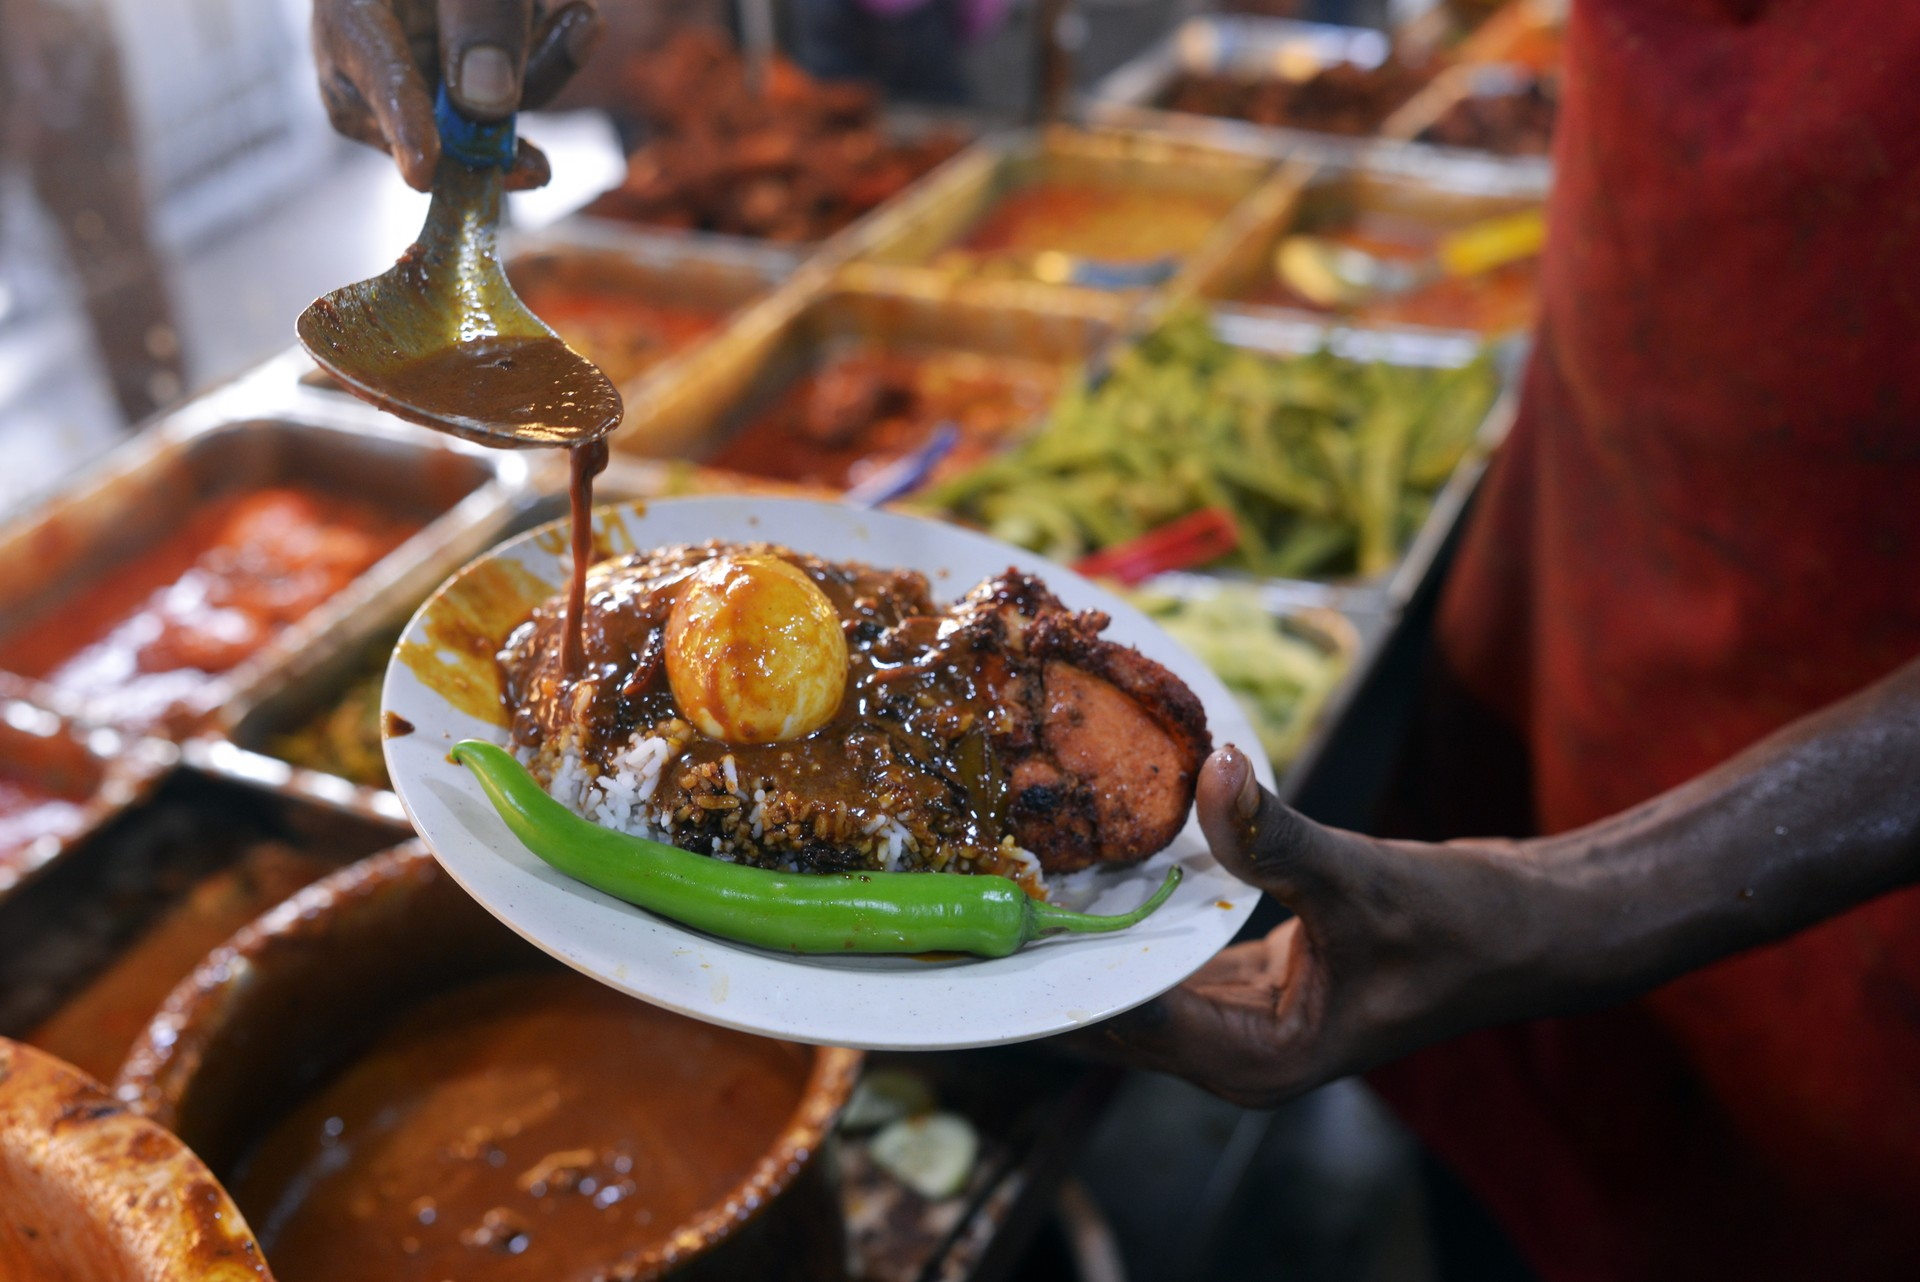 Nasi kandar at a street food stall in Malaysia